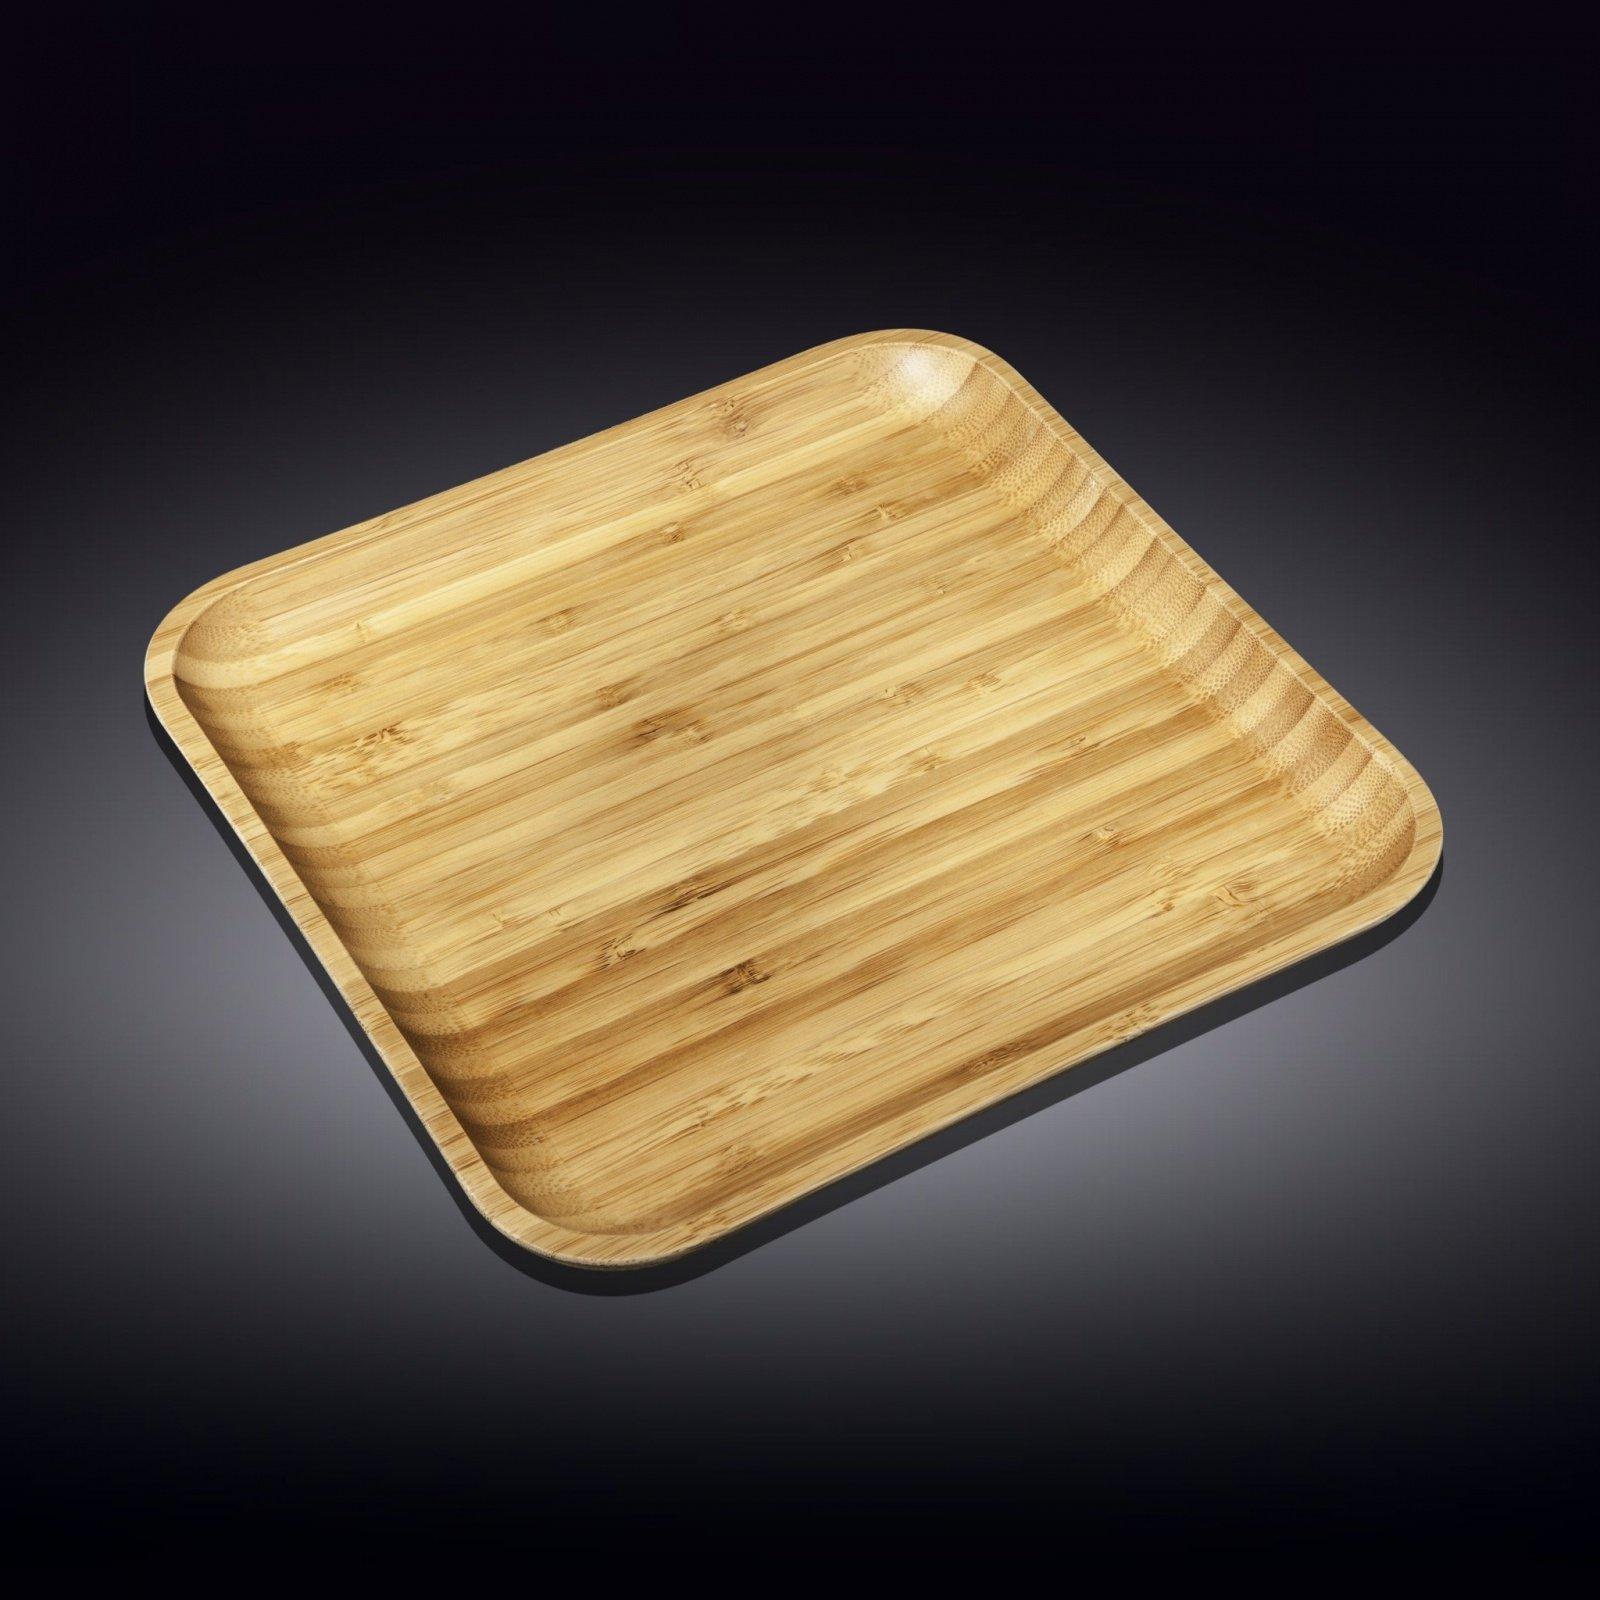 Тарелка бамбуковая Wilmax сервировочная квадратная 35,5 x 35,5 см